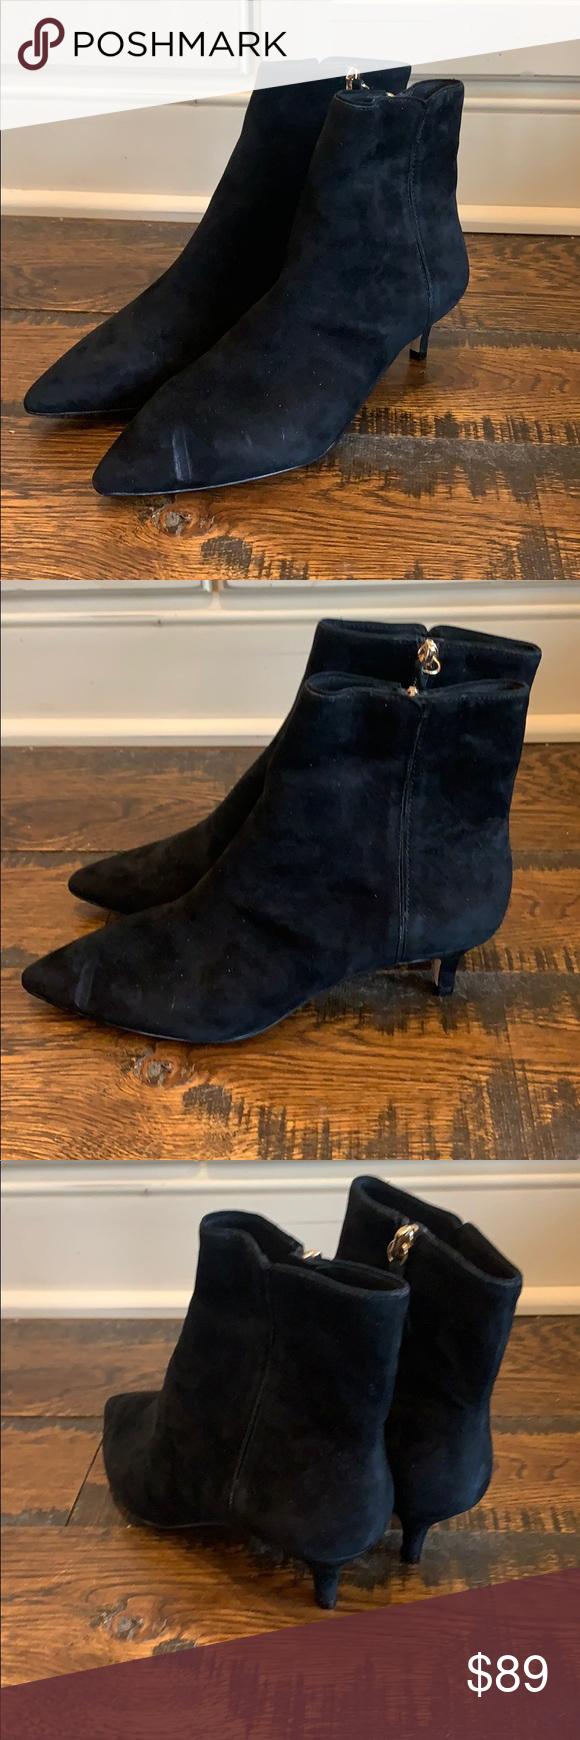 J Crew Fiona Kitten Heel Ankle Boots Suede Ab101 In 2020 Kitten Heel Ankle Boots Boots Heeled Ankle Boots